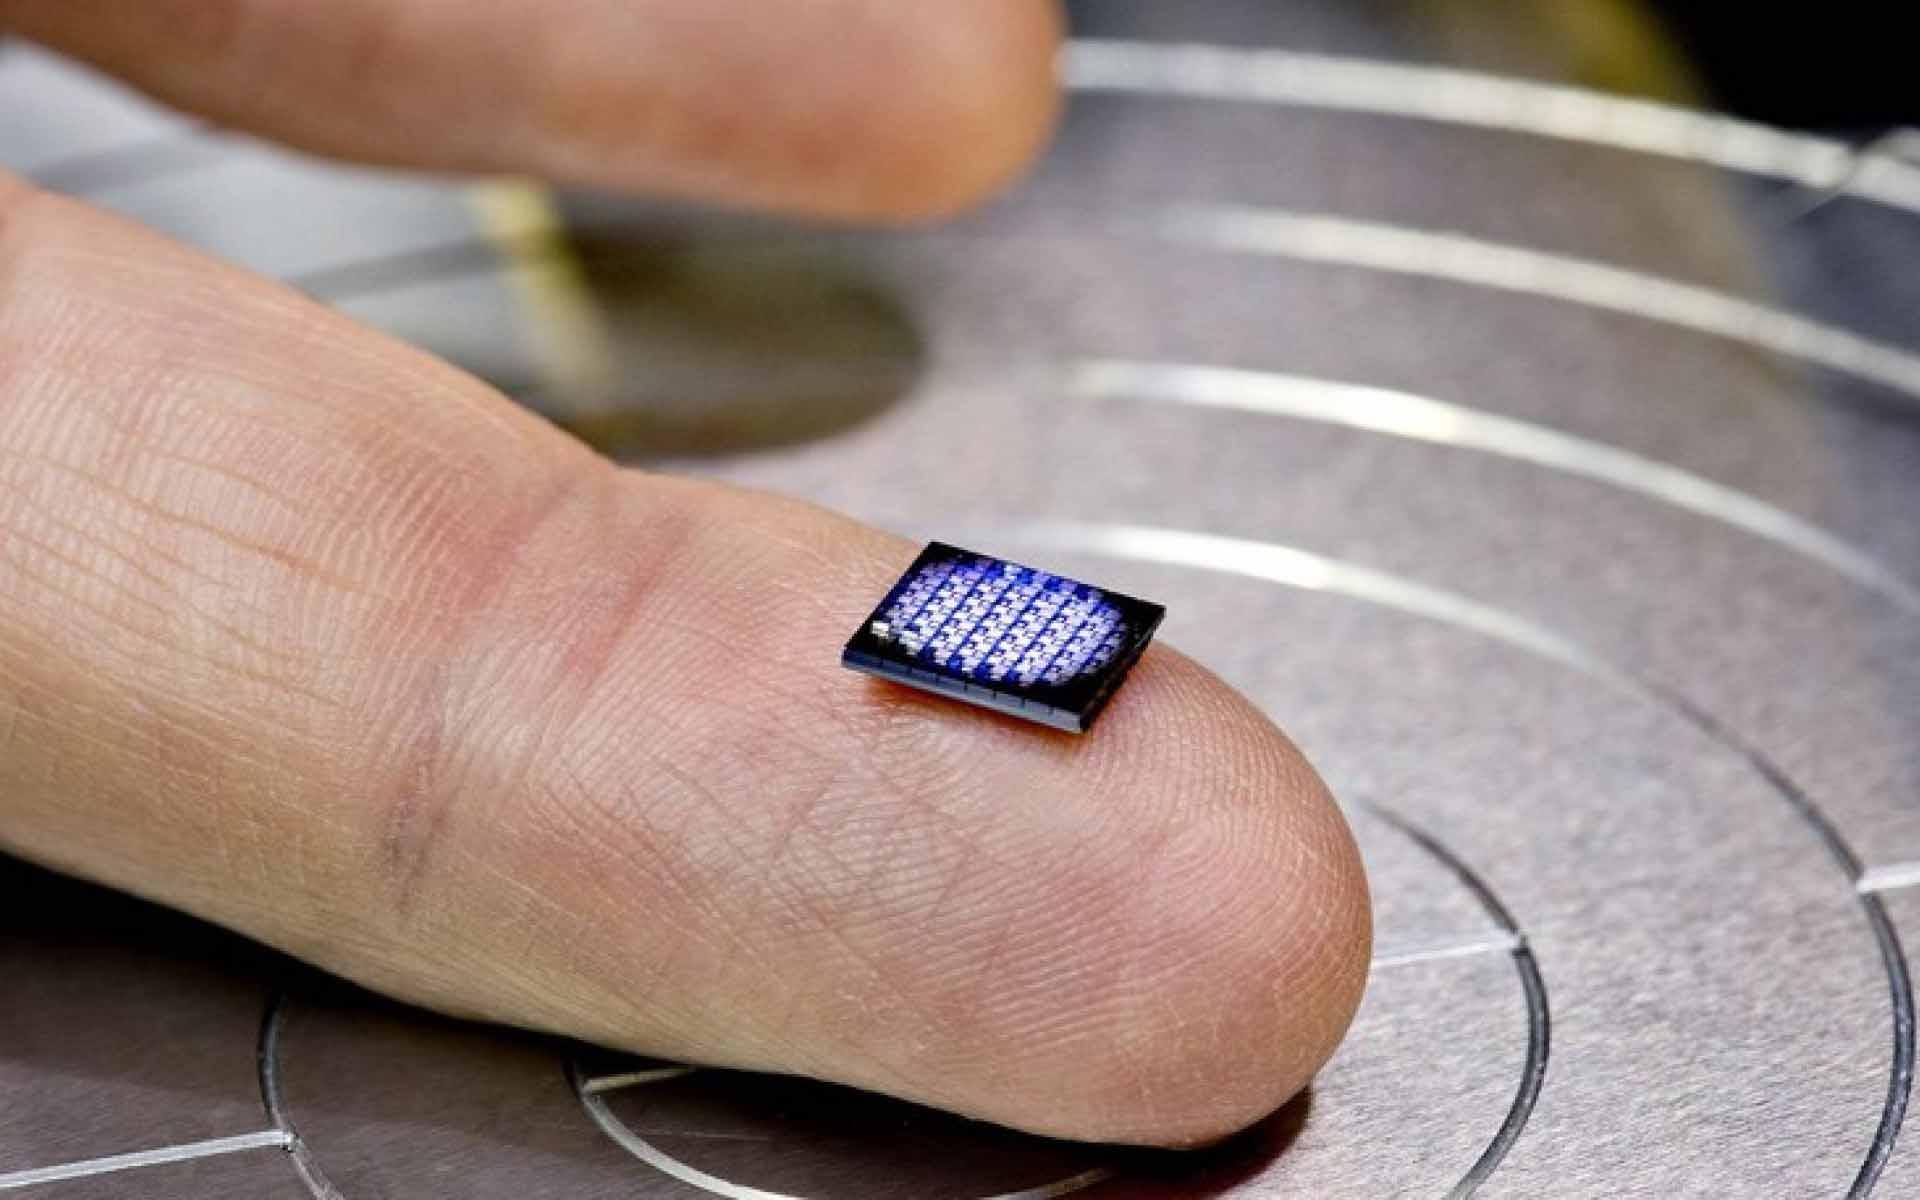 IBM's New 'World's Smallest Computer' is Built for Blockchain